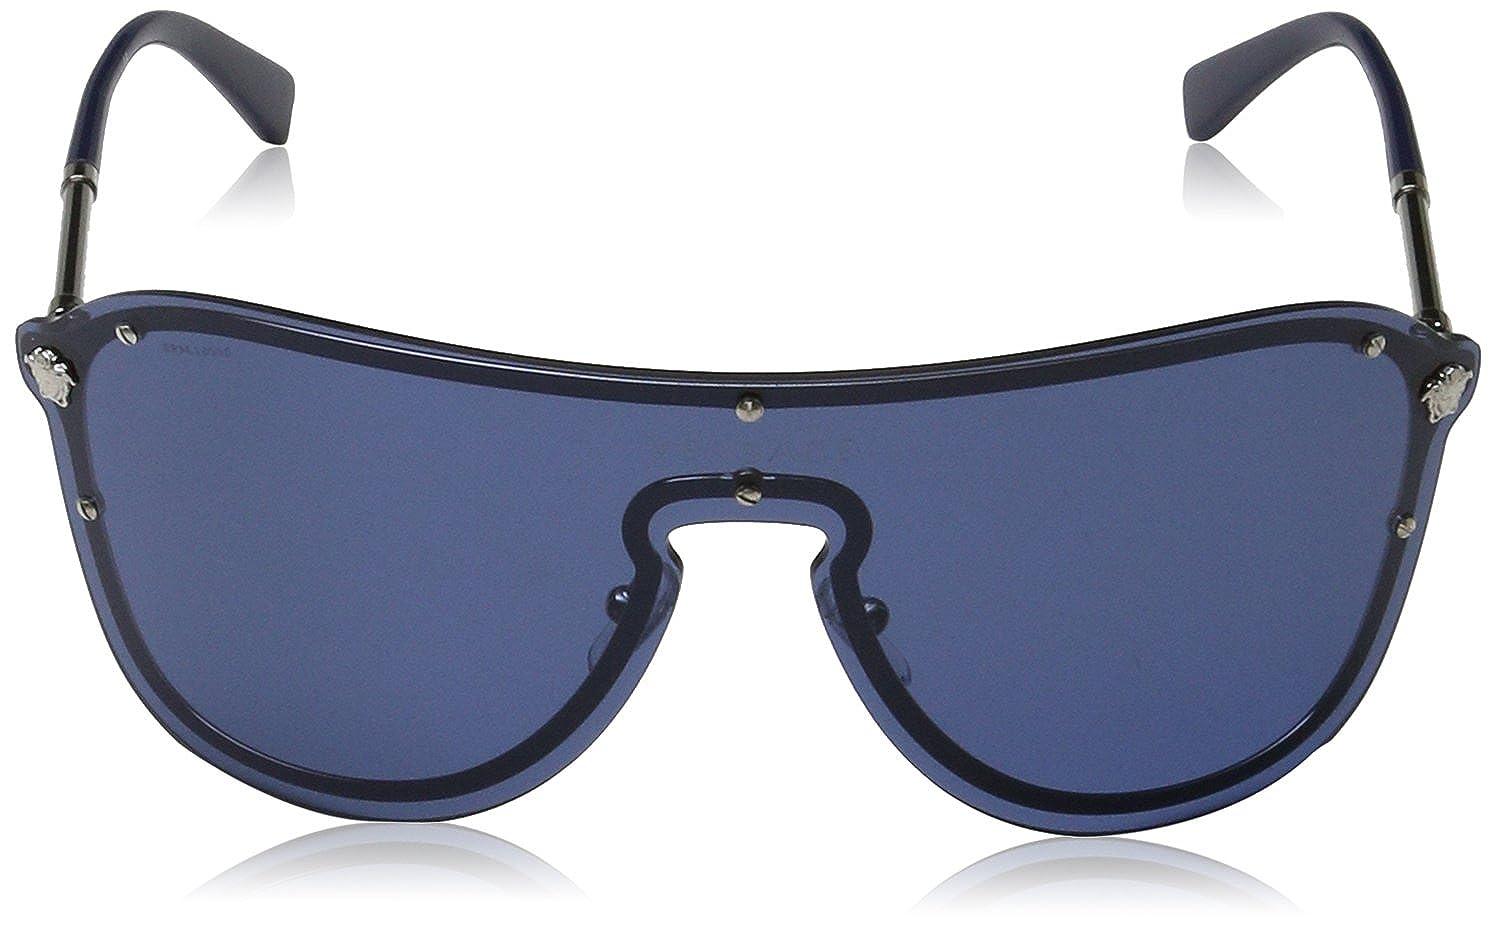 76b45a421d Amazon.com  Versace Sunglasses Silver Blue Metal - Non-Polarized - 44mm   Versace  Clothing